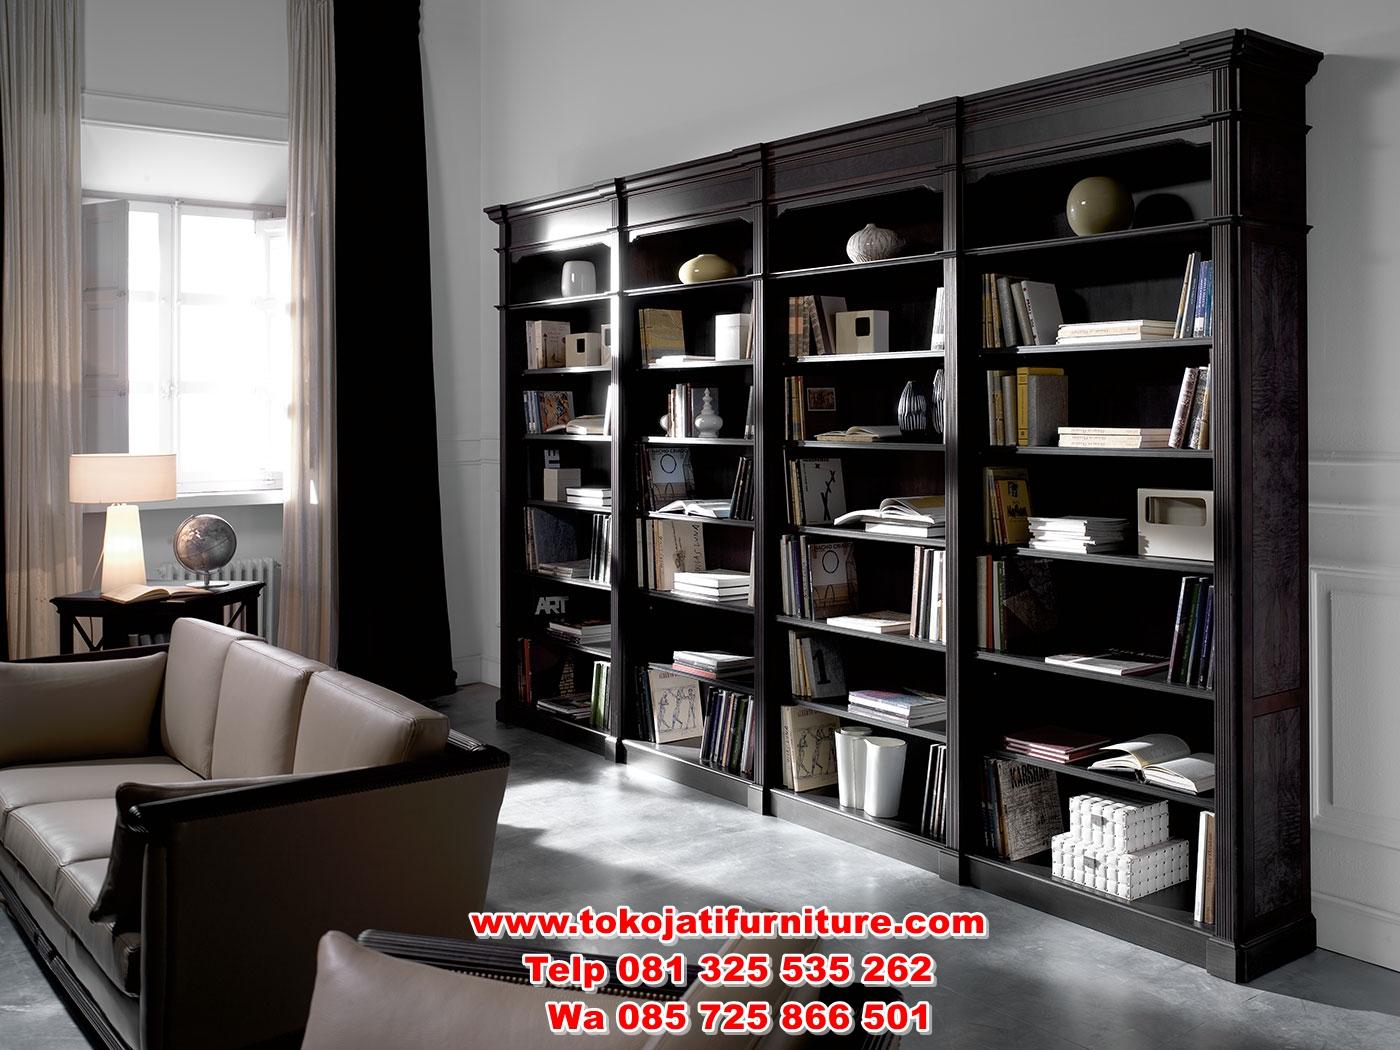 https://furnitureklasikan.com/wp-content/uploads/2018/03/lemari-buku-jati-minimalis-modern.jpg